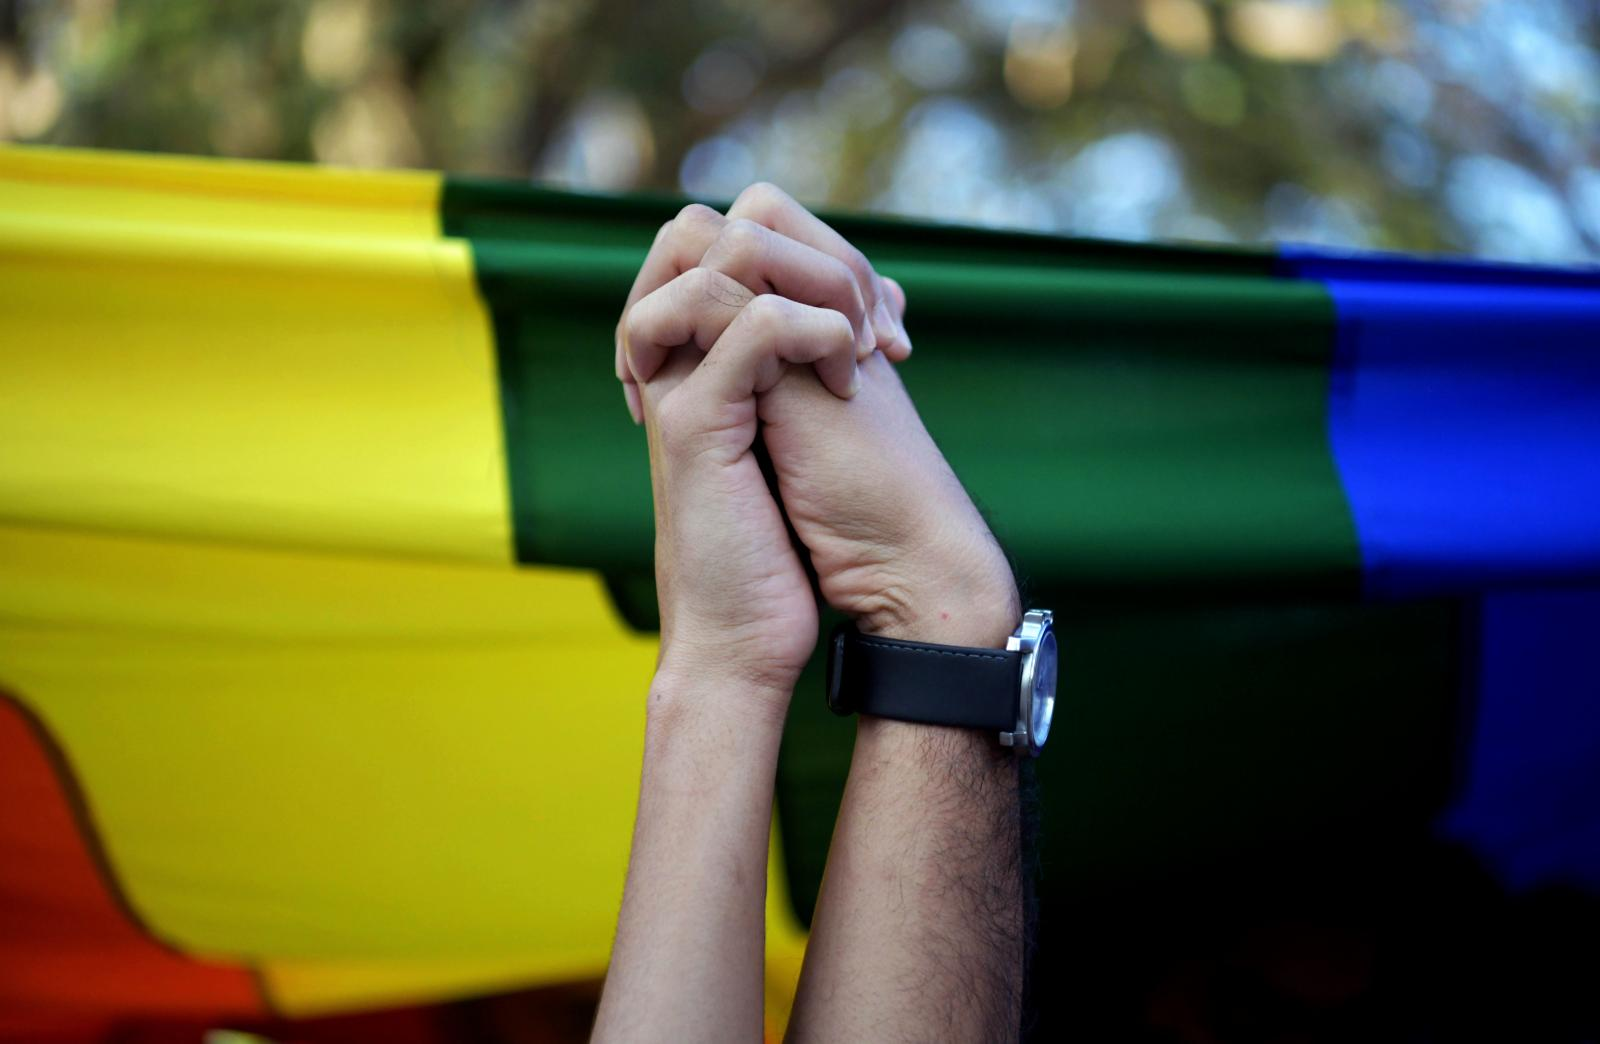 Photography image - Loading Pride_Hands.jpeg